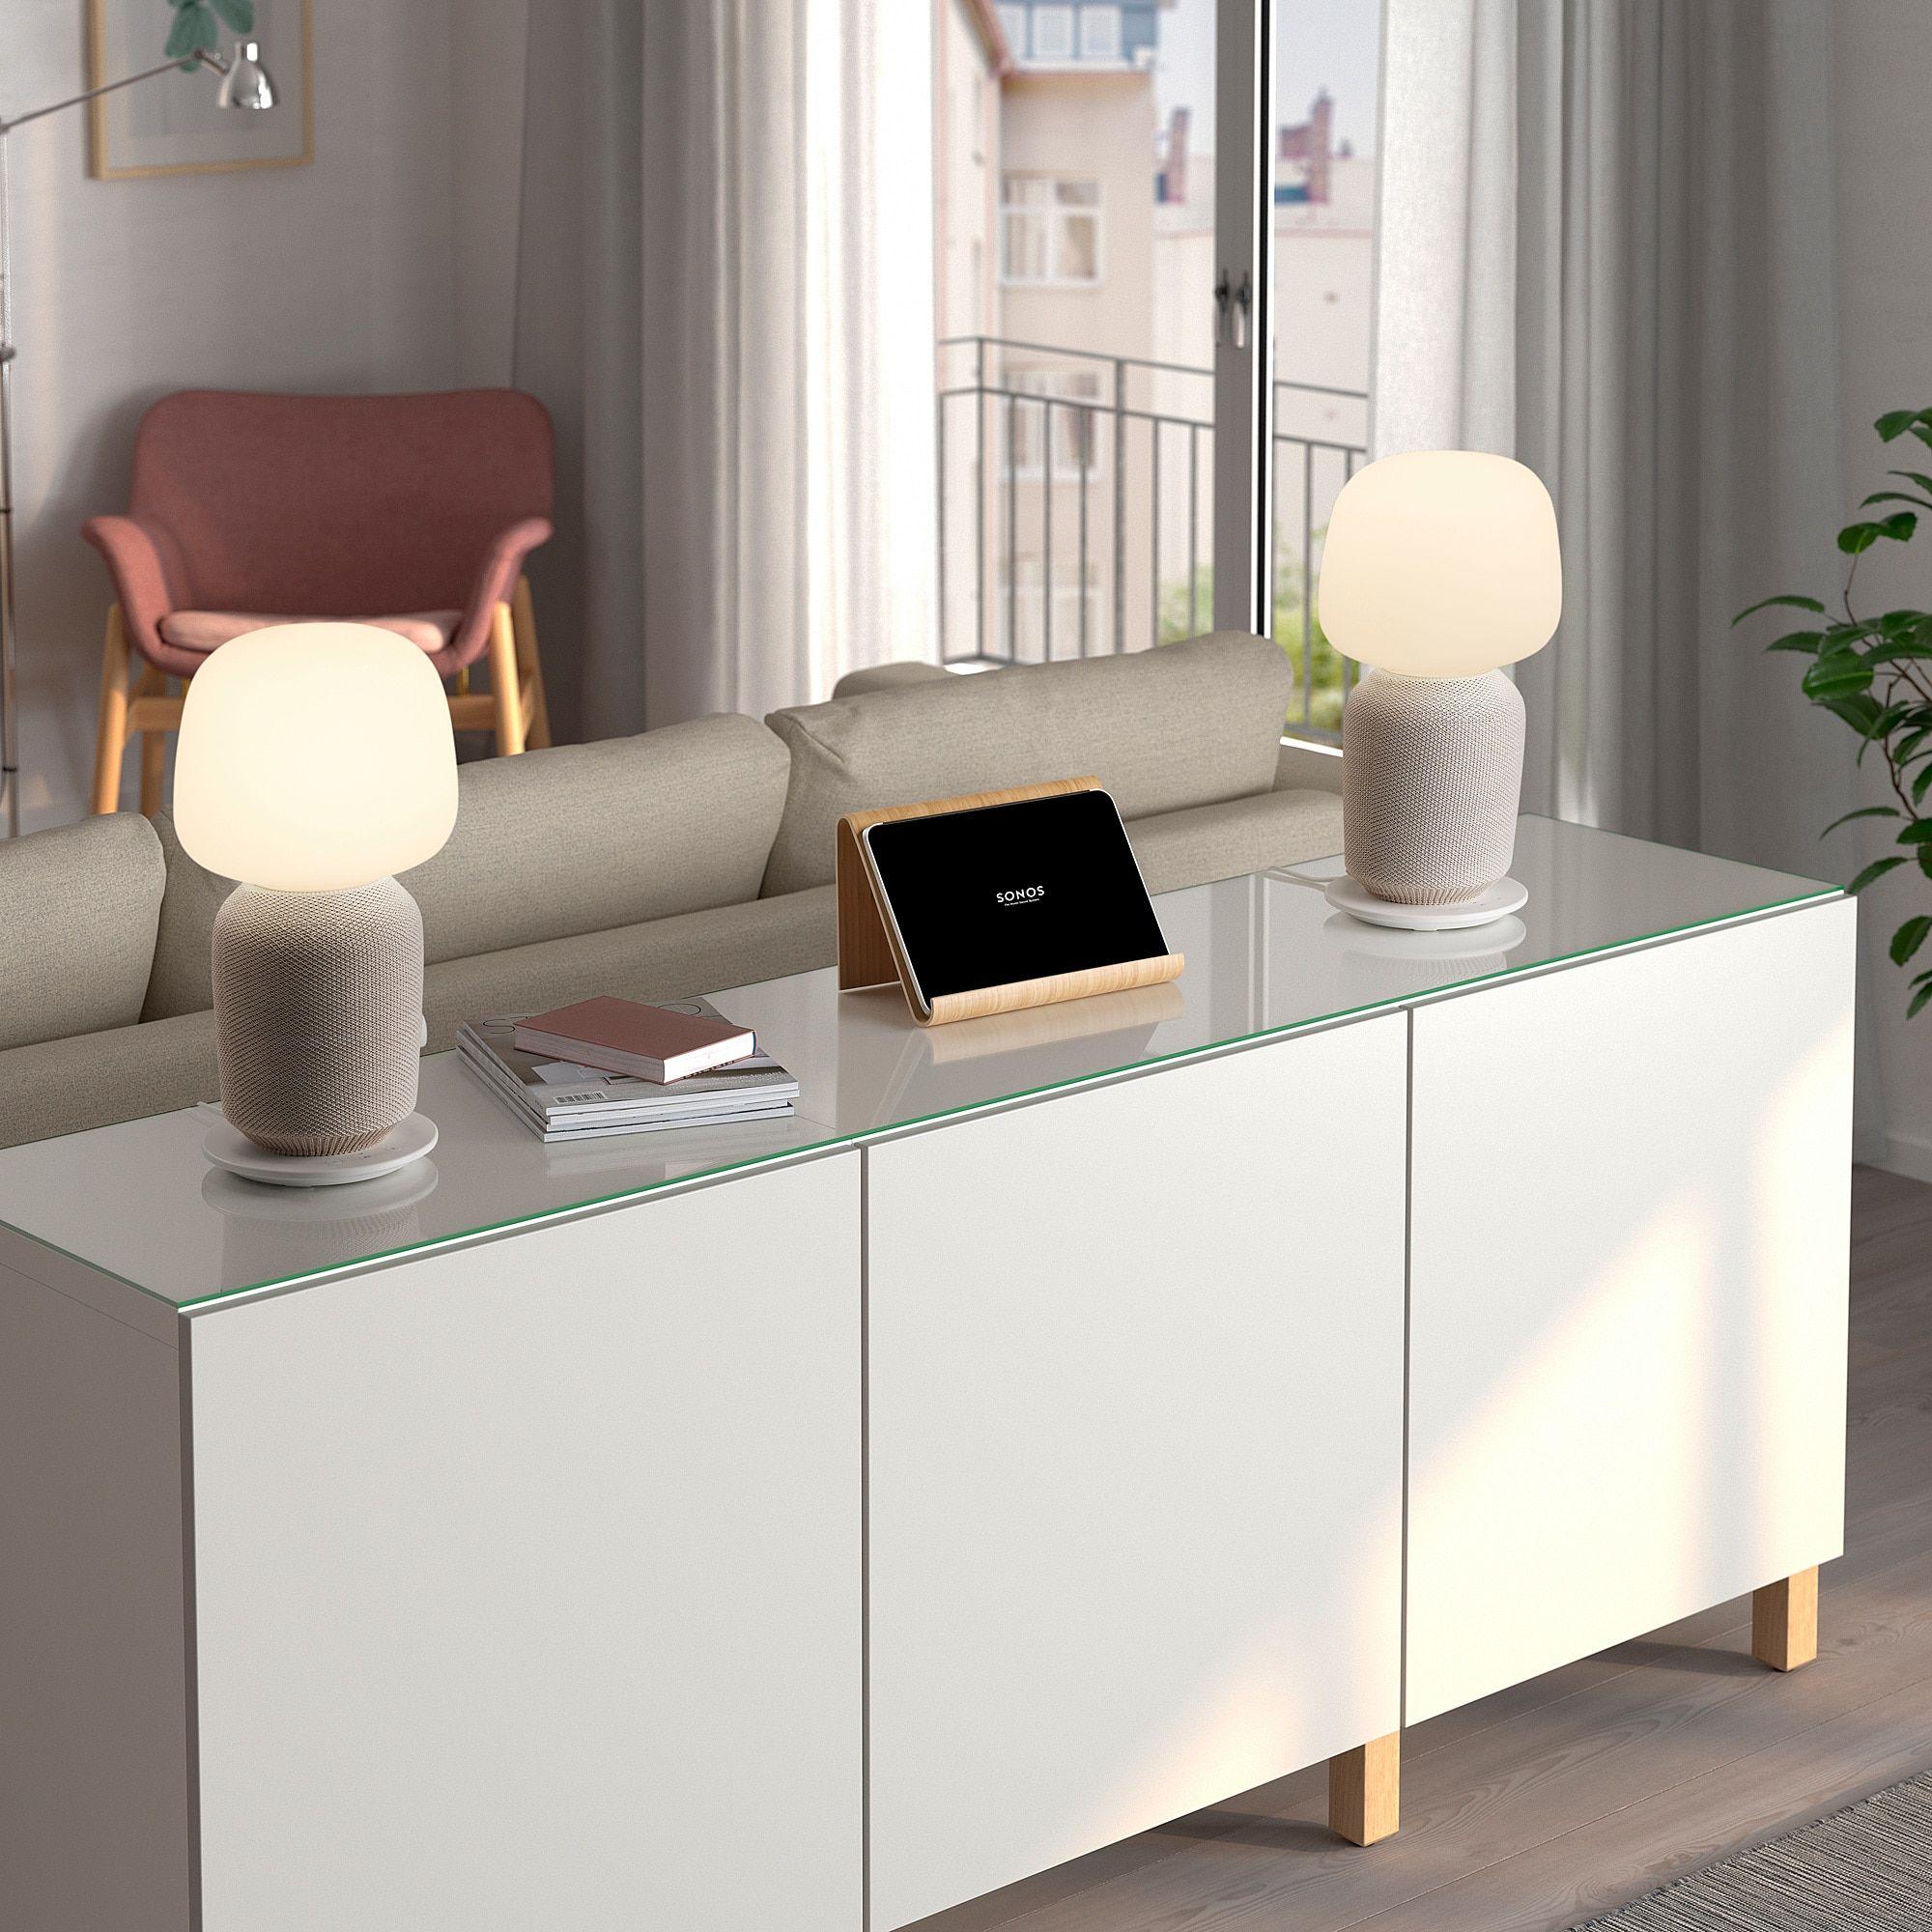 Ikea Symfonisk Table Lamp With Wifi Speaker White Ikea Symfonisk Inspirationen In 2019 Tischleuchte Ikea Und Heimkino